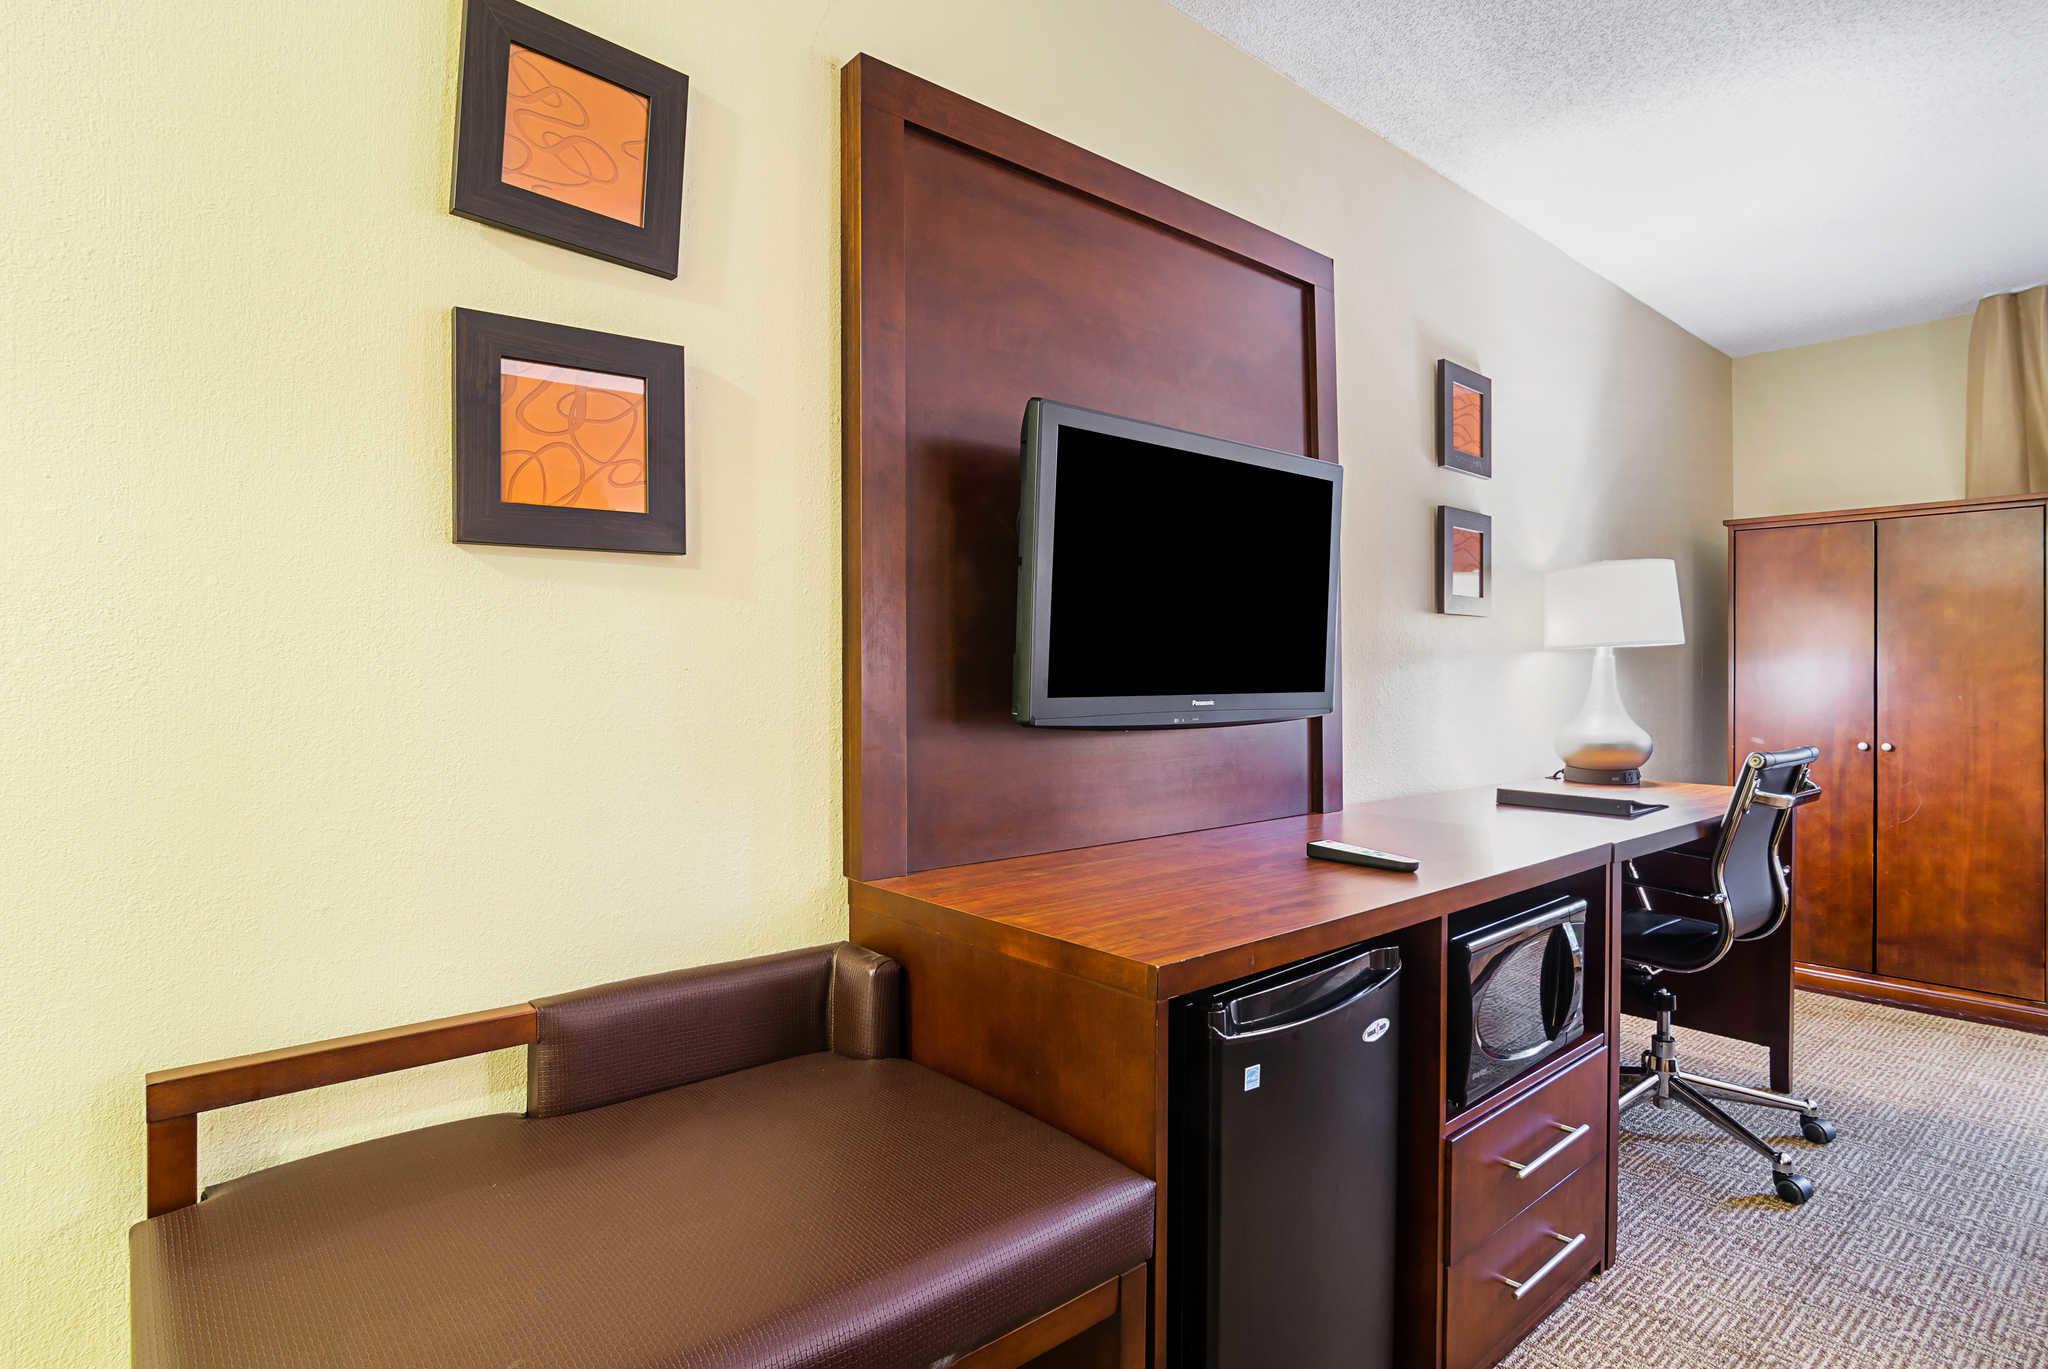 Comfort Inn & Suites Duke University-Downtown image 13